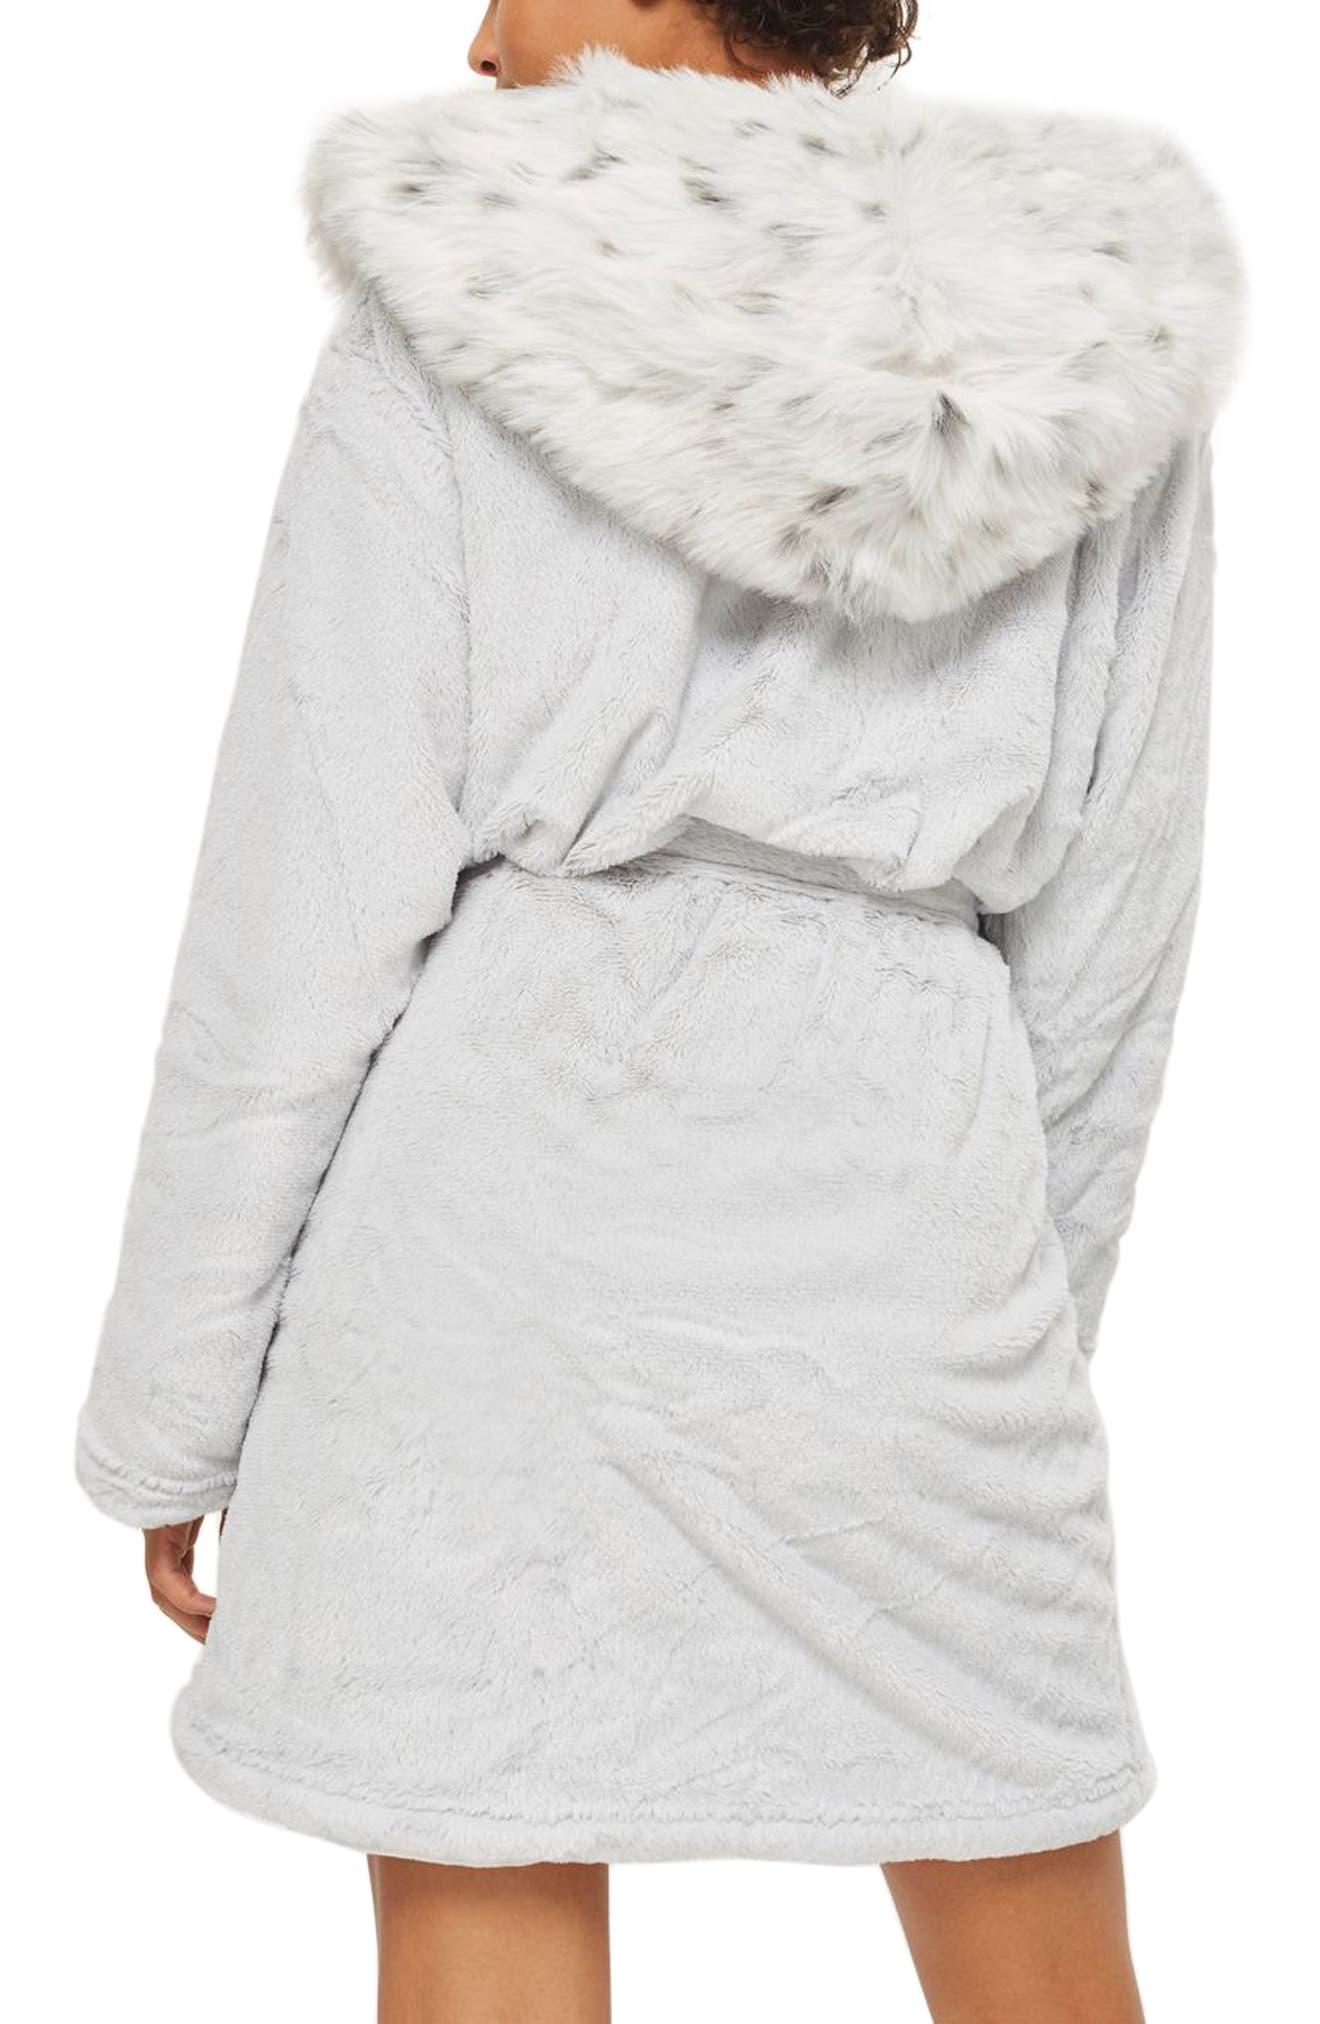 Faux Fur Hooded Short Robe,                             Alternate thumbnail 2, color,                             020